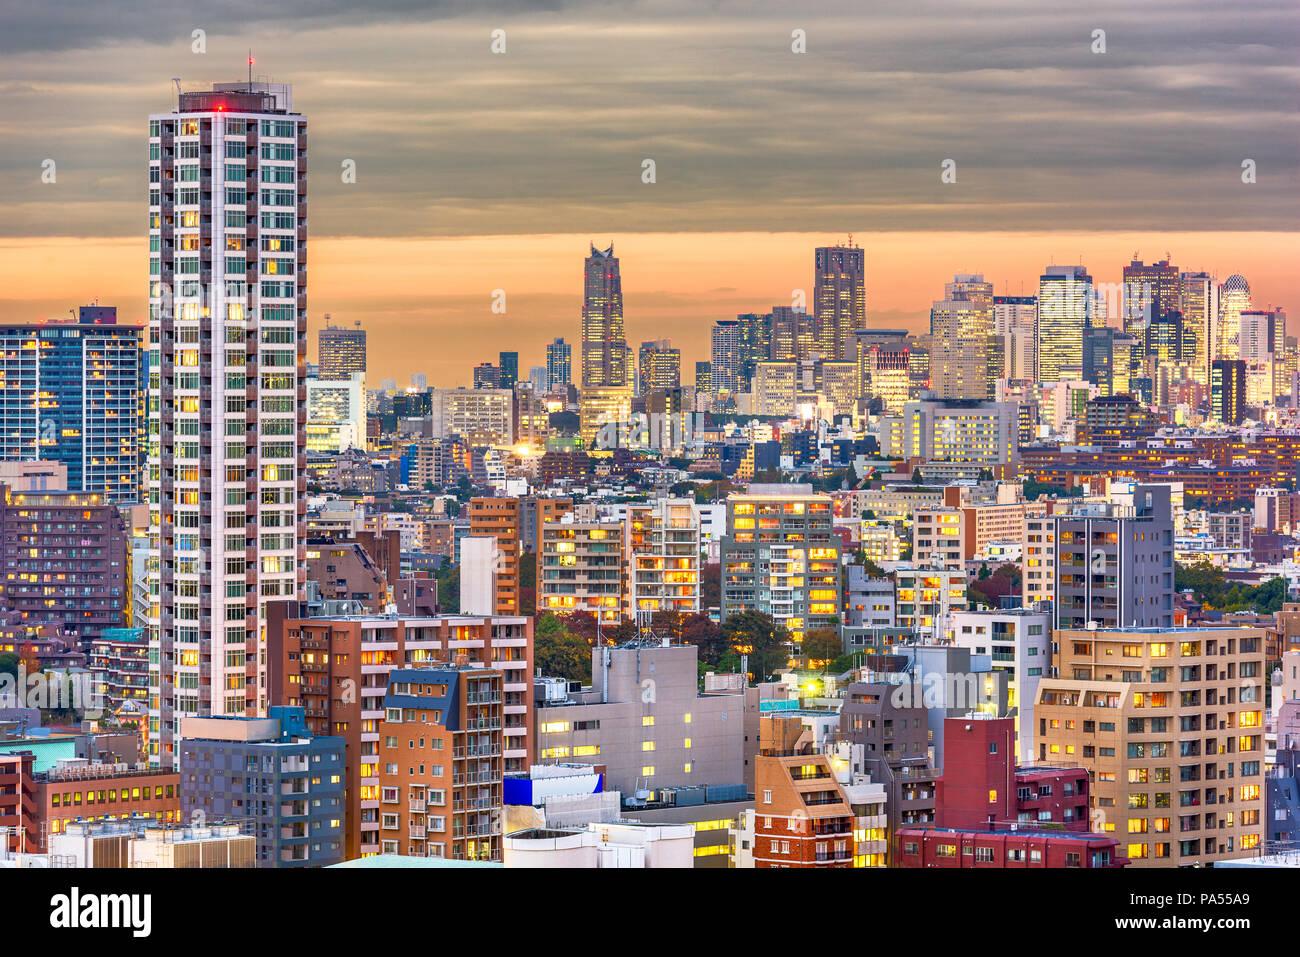 Tokyo, Japan twilight cityscape towards the Shinjuku Ward financial district. - Stock Image